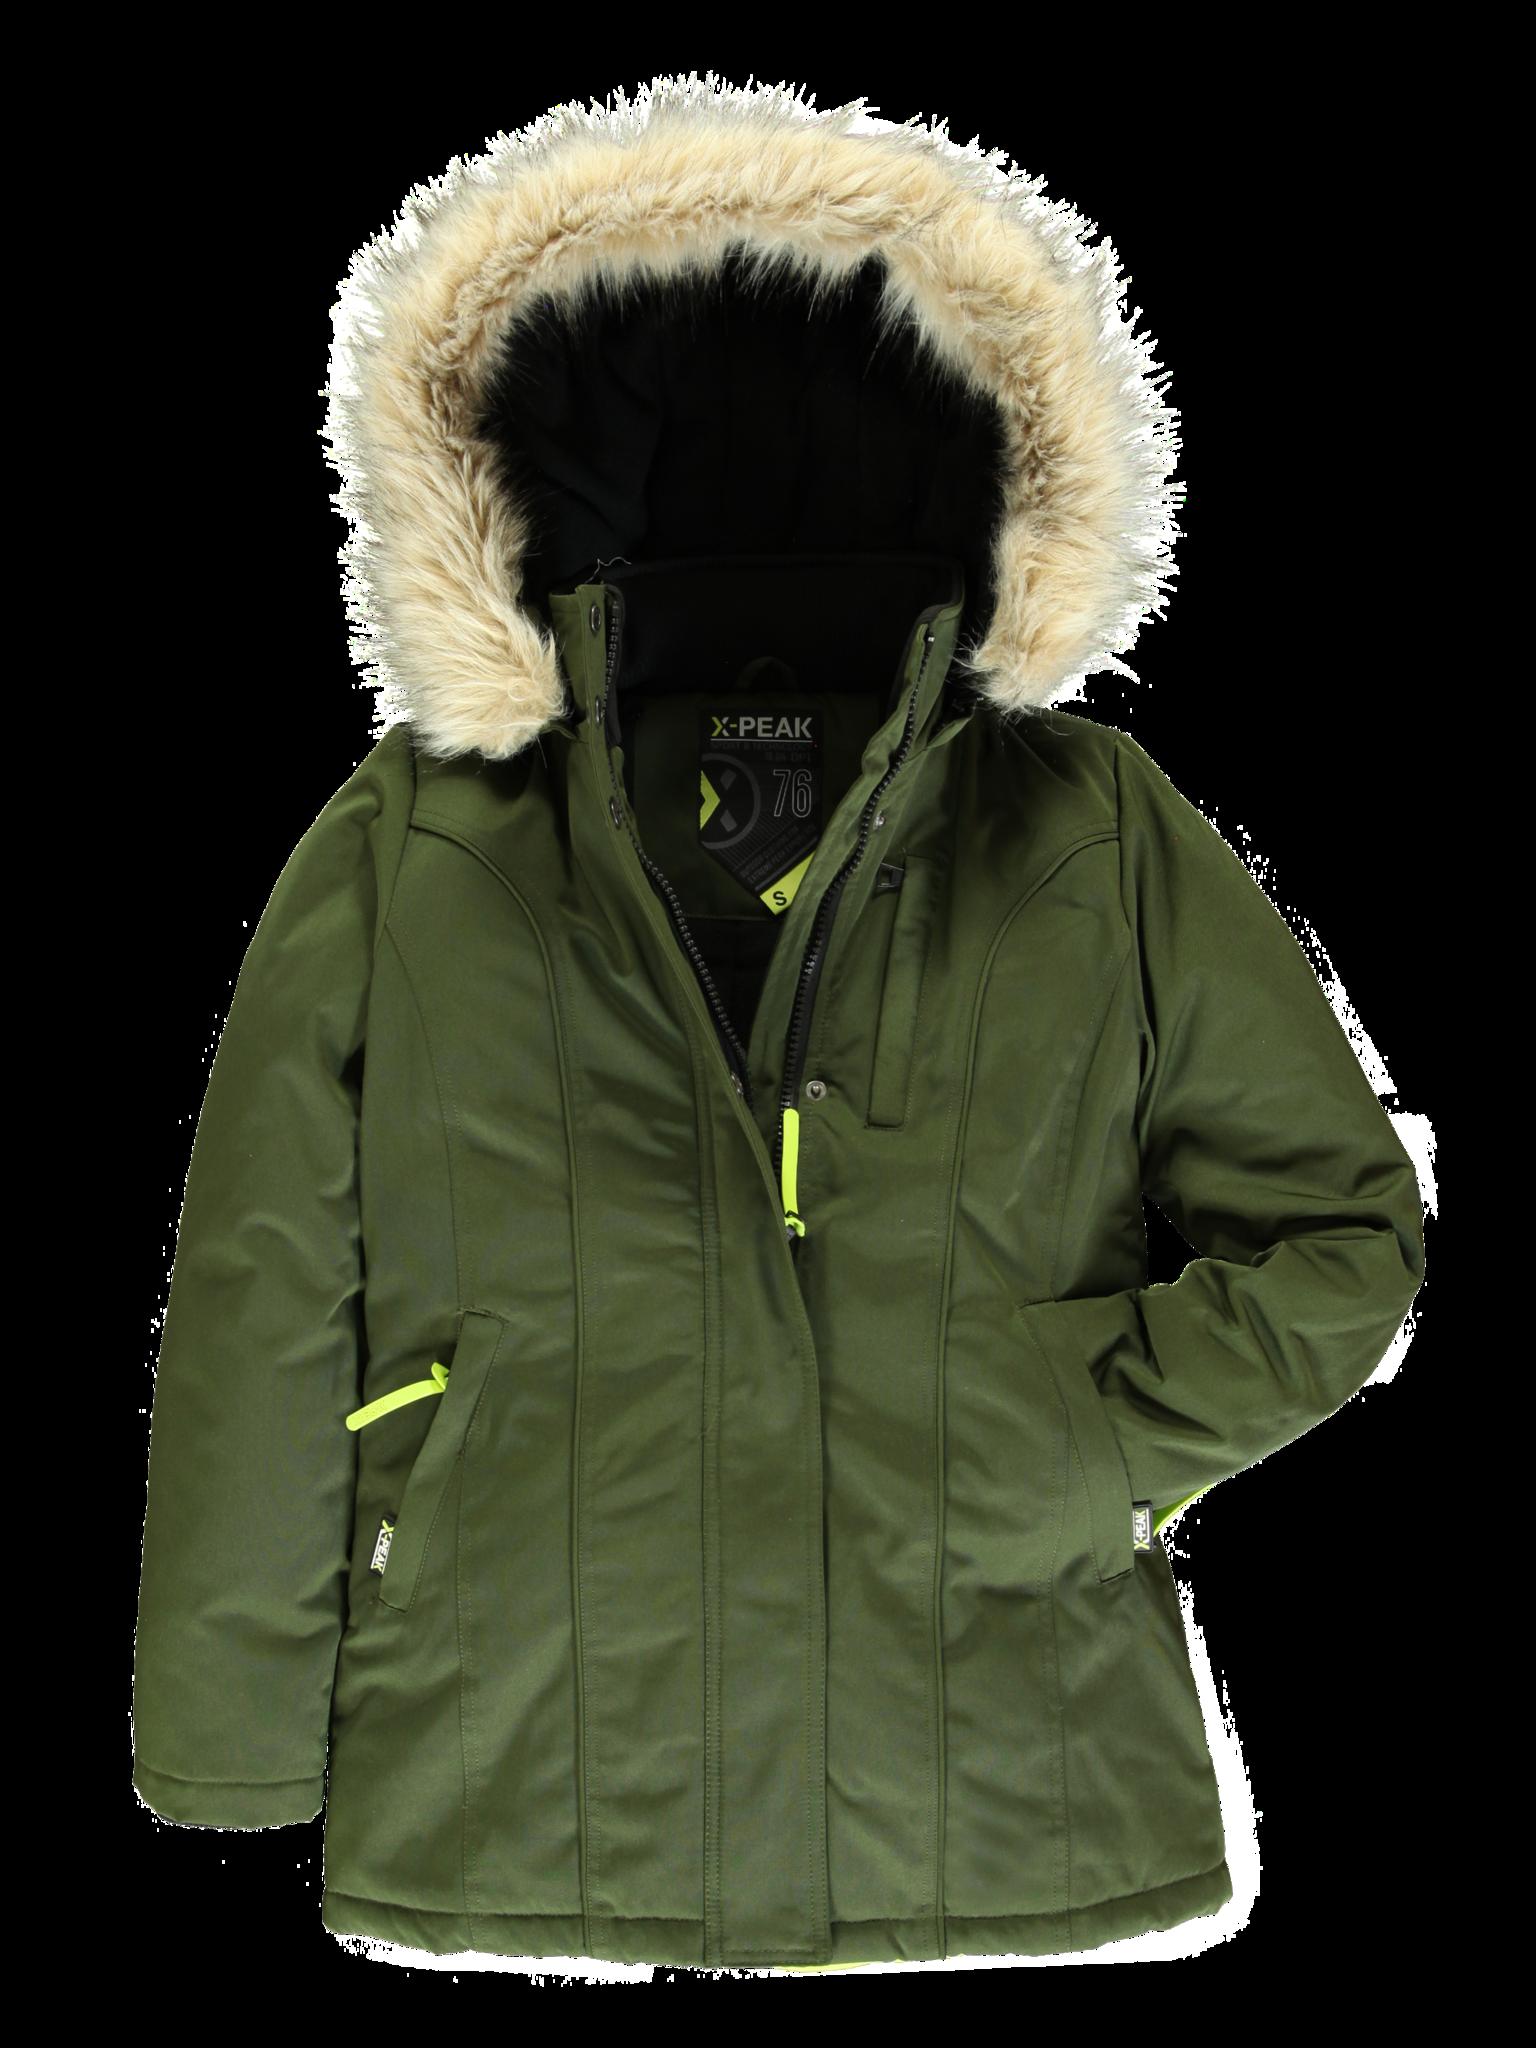 All Brands | Winterproducts Ladies | Jacket | 12 pcs/box